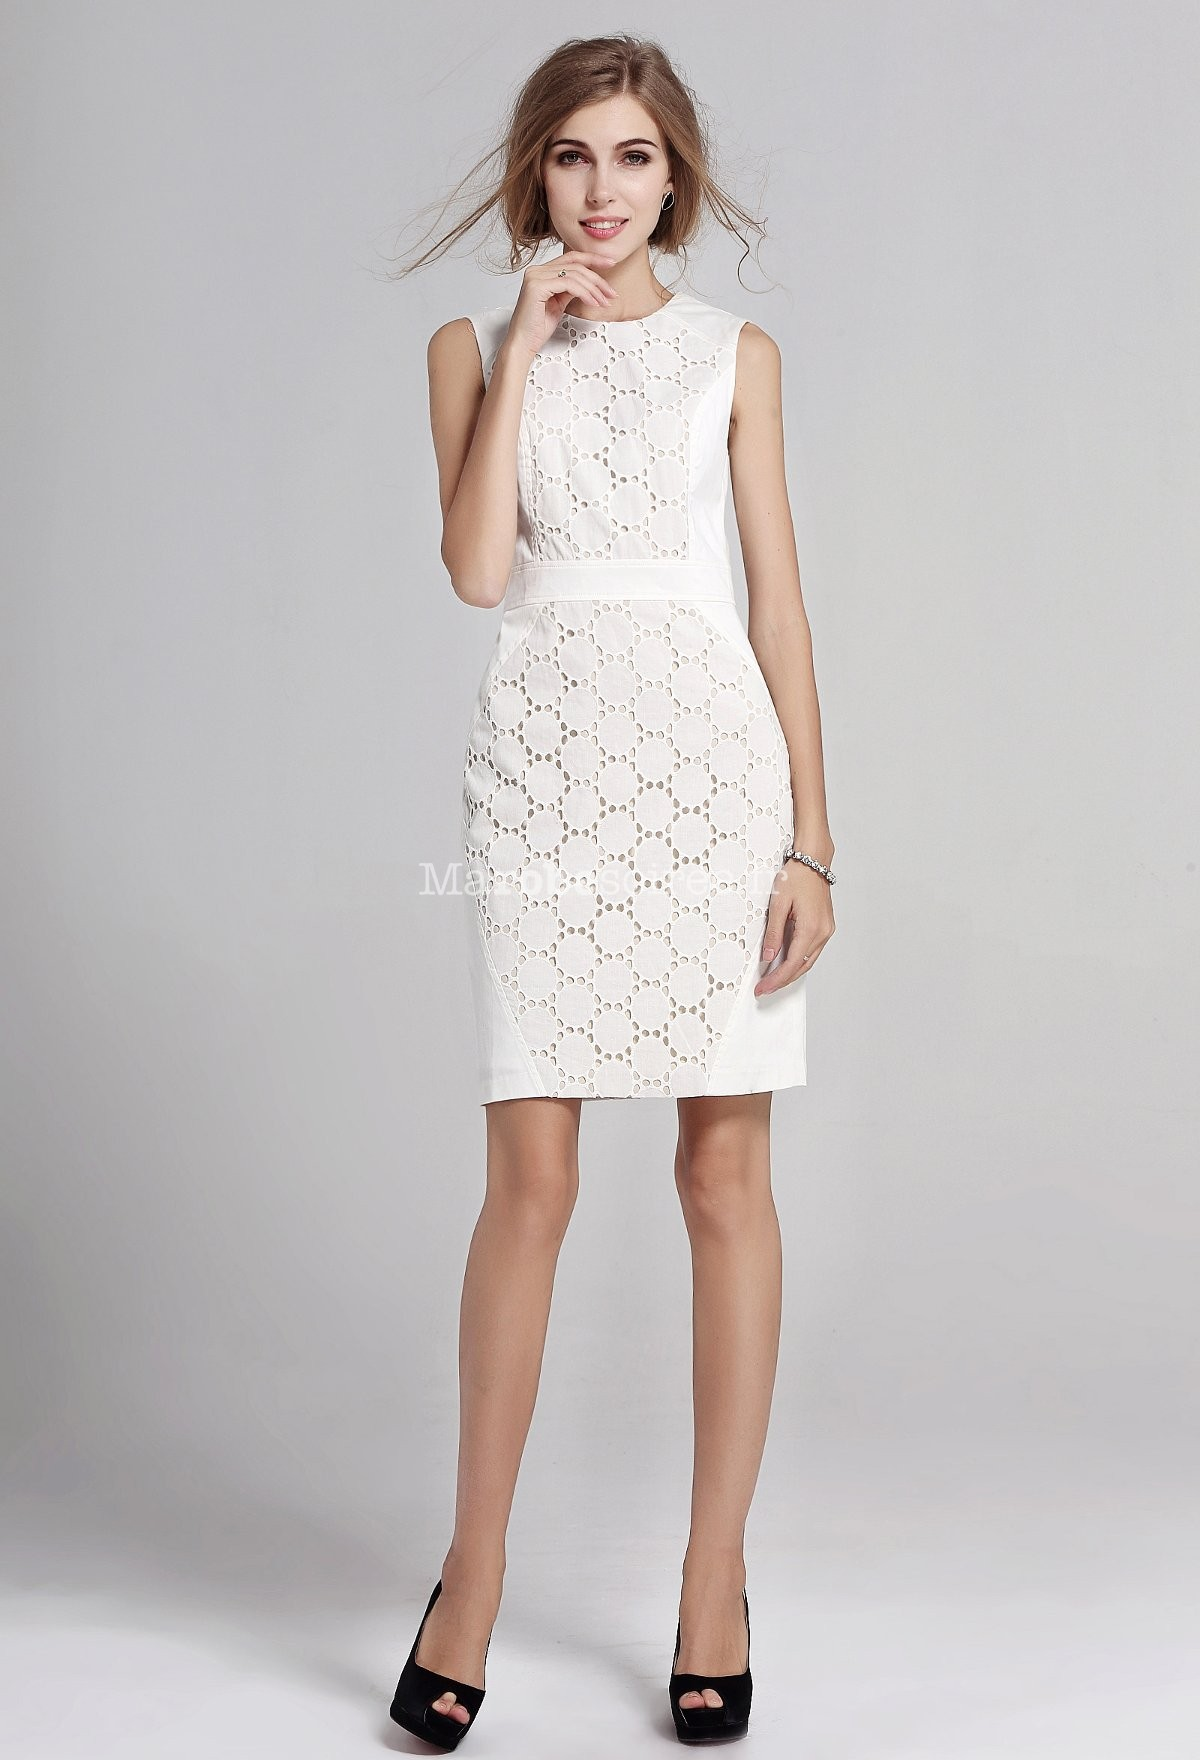 robe de cocktail blanche dentelle genoux. Black Bedroom Furniture Sets. Home Design Ideas